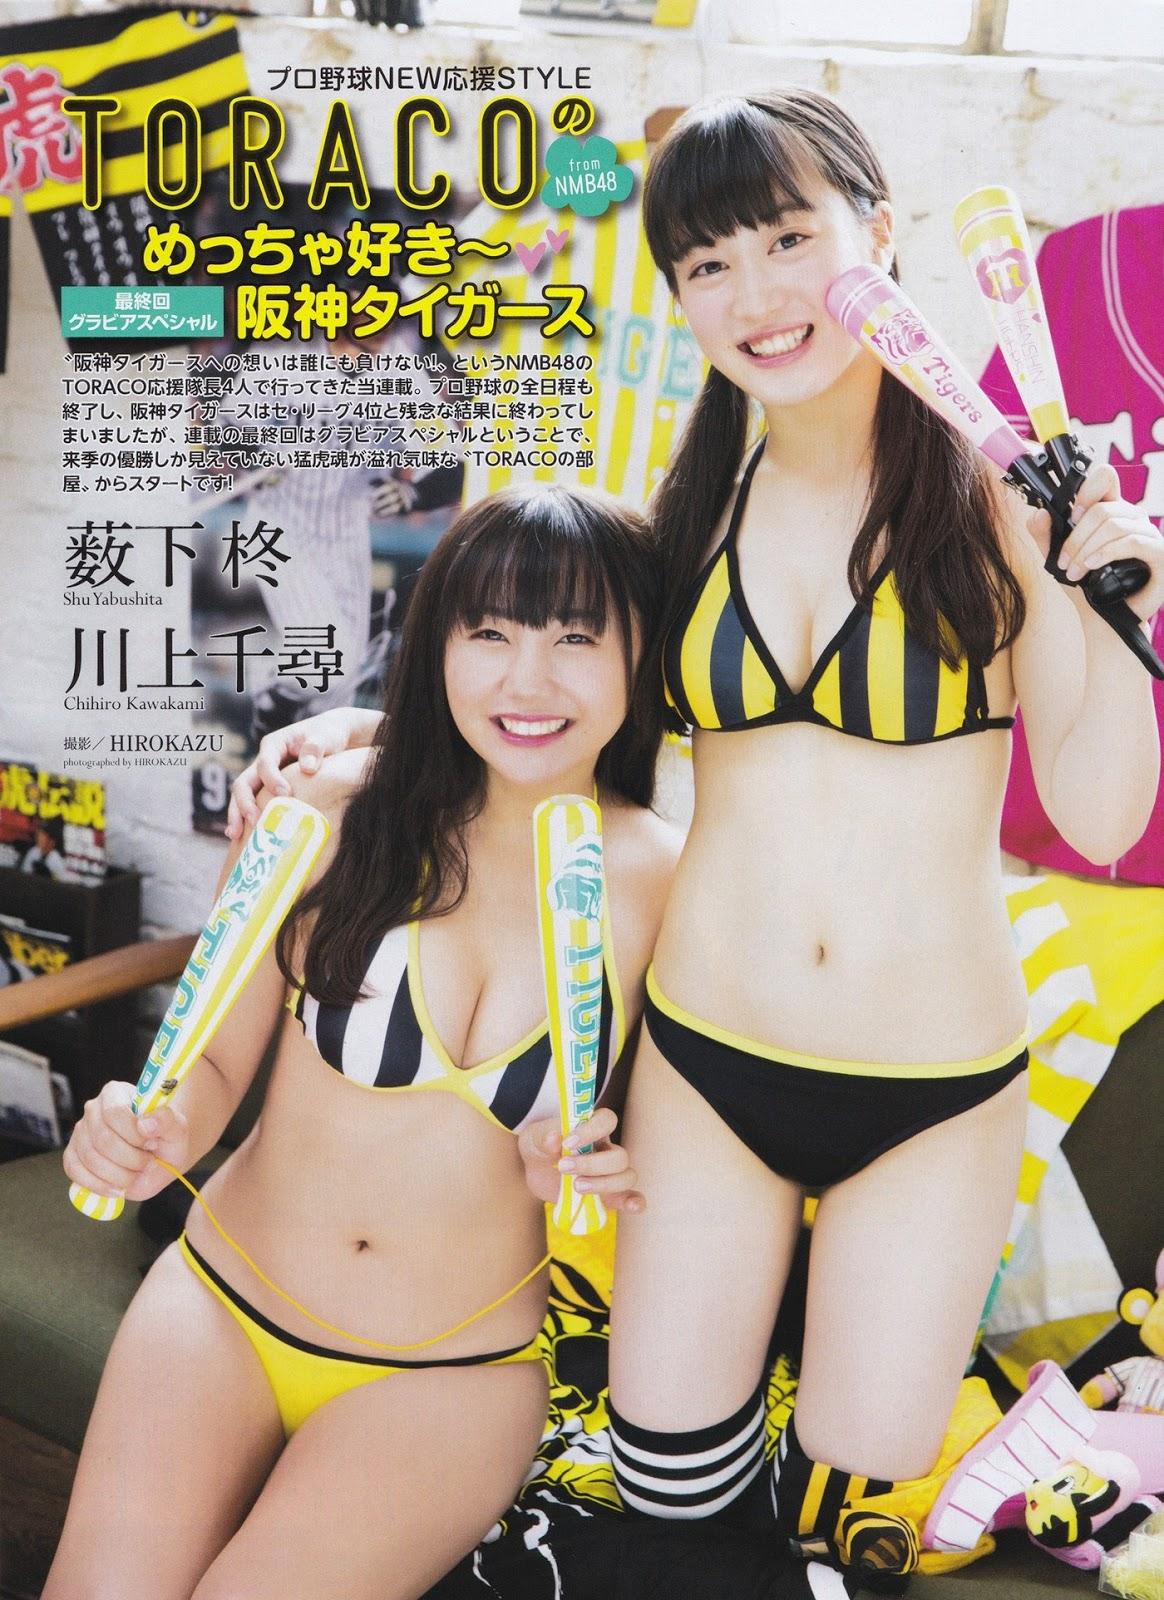 Yabushita Shu 薮下柊, Kawakami Chihiro 川上千尋 NMB48, ENTAME 2016.12 (月刊エンタメ 2016年12月号)